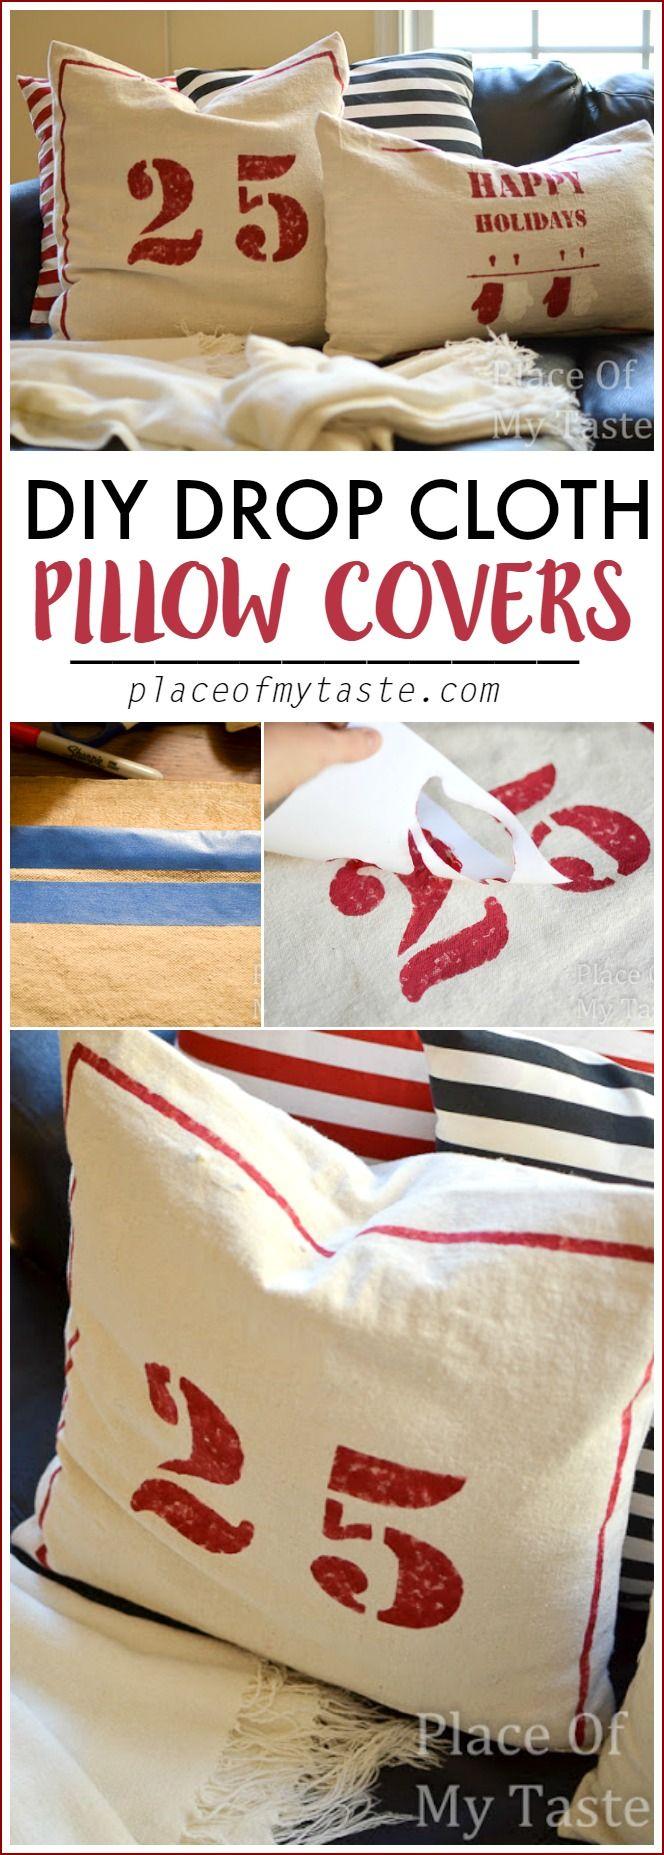 DIY DROP CLOTH PILLOW COVERS. Fun Christmas sewing tutorial!